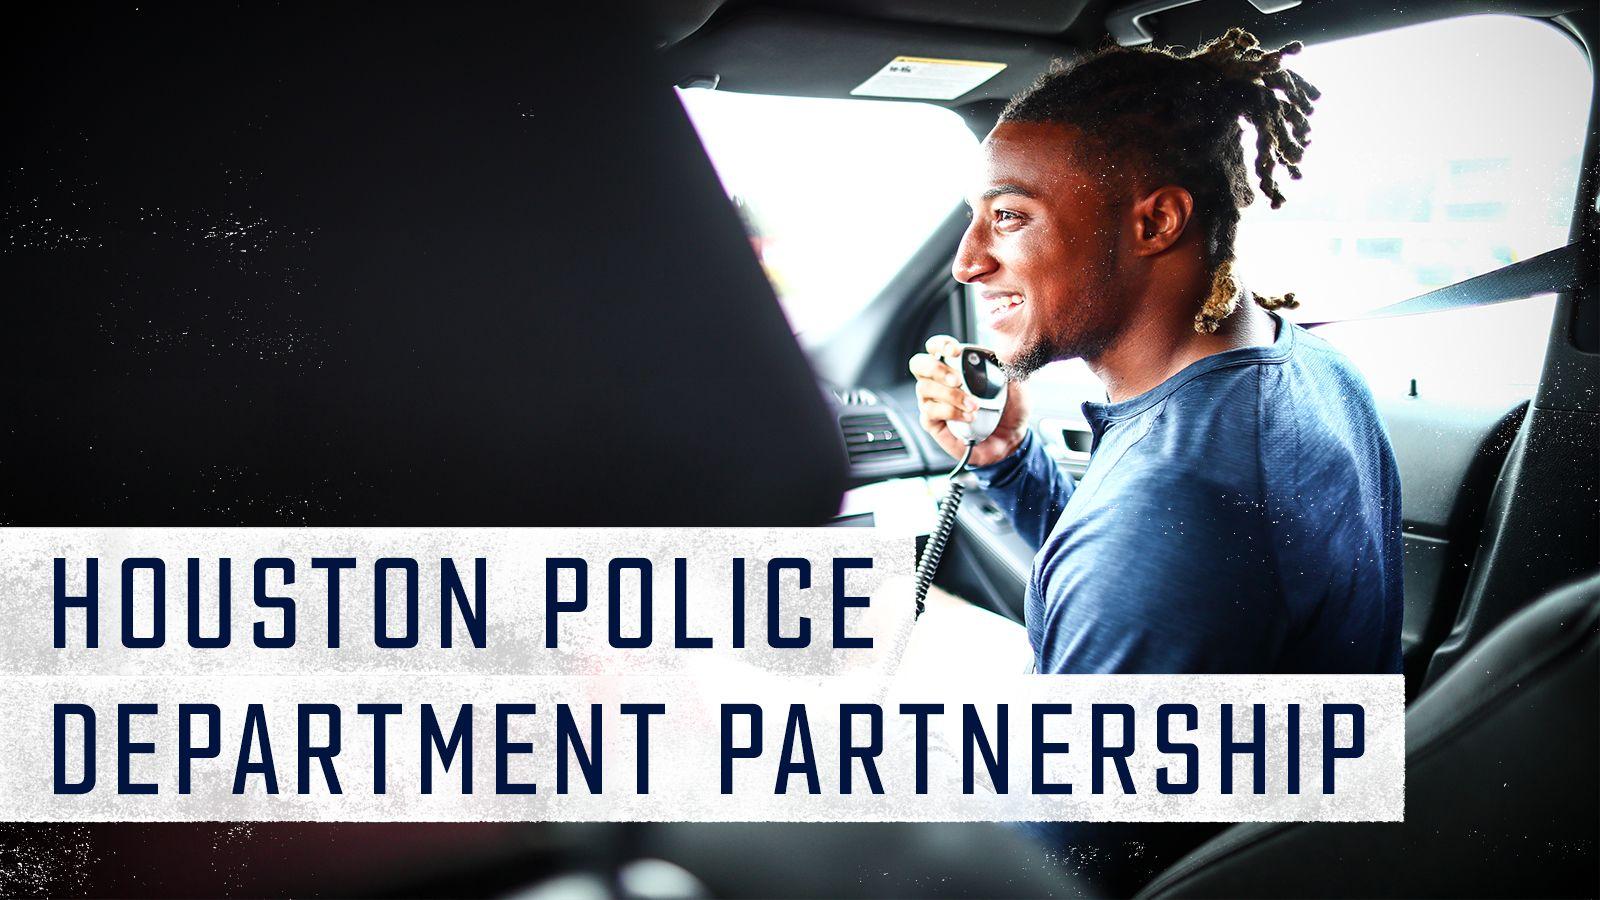 Houston Police Department Partnership